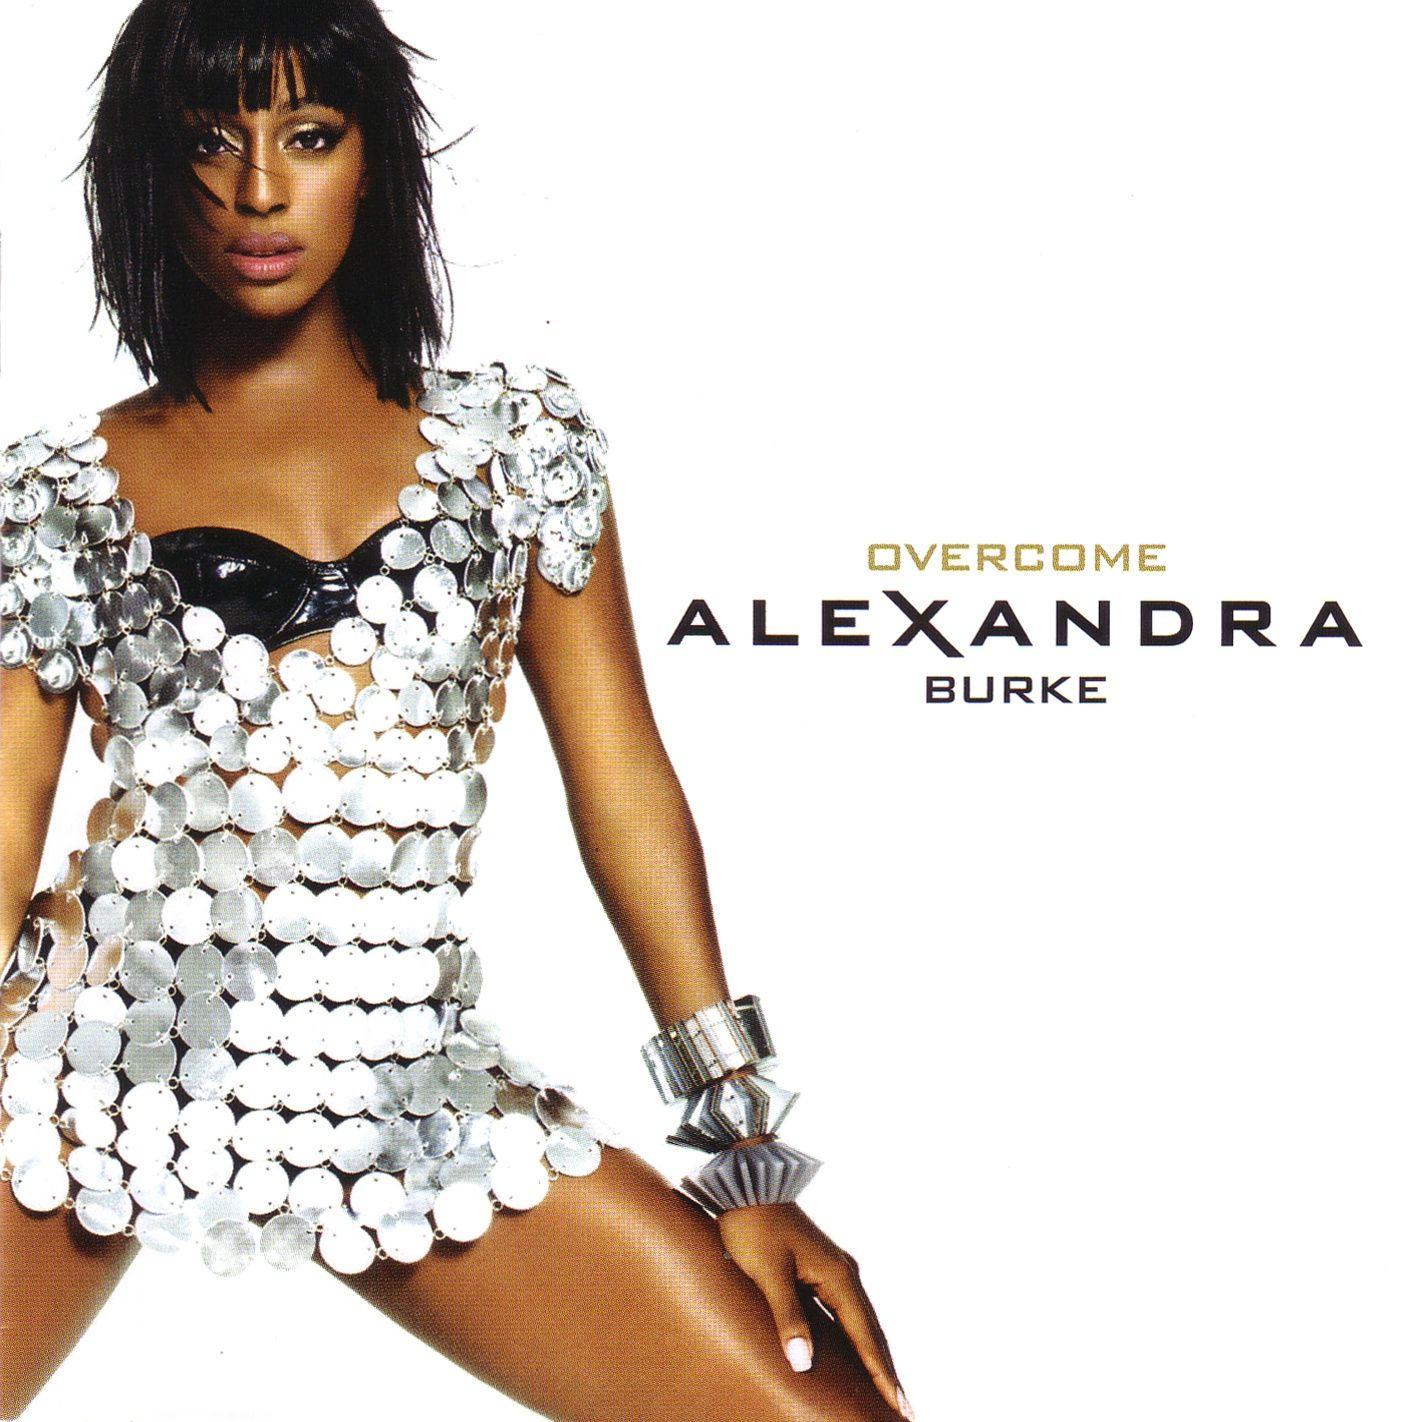 Alexandra Burke - Overcome album cover